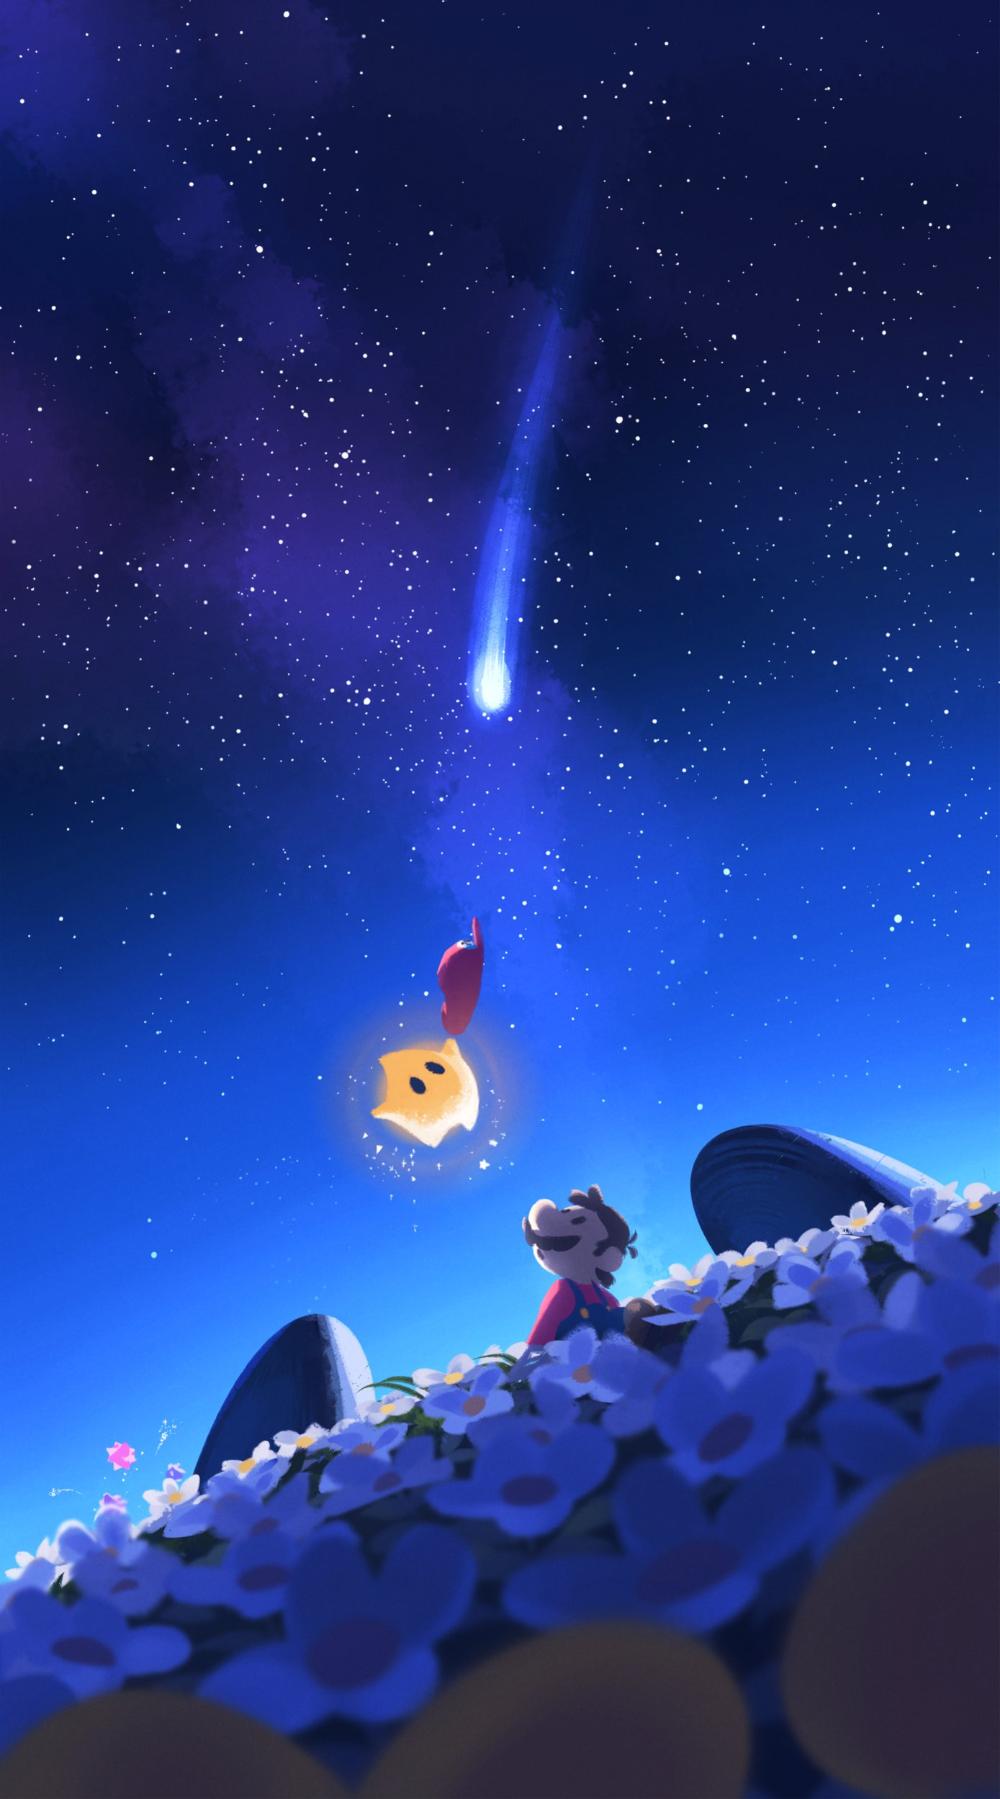 Danfango On Twitter Mario Art Super Mario Art Super Mario Bros